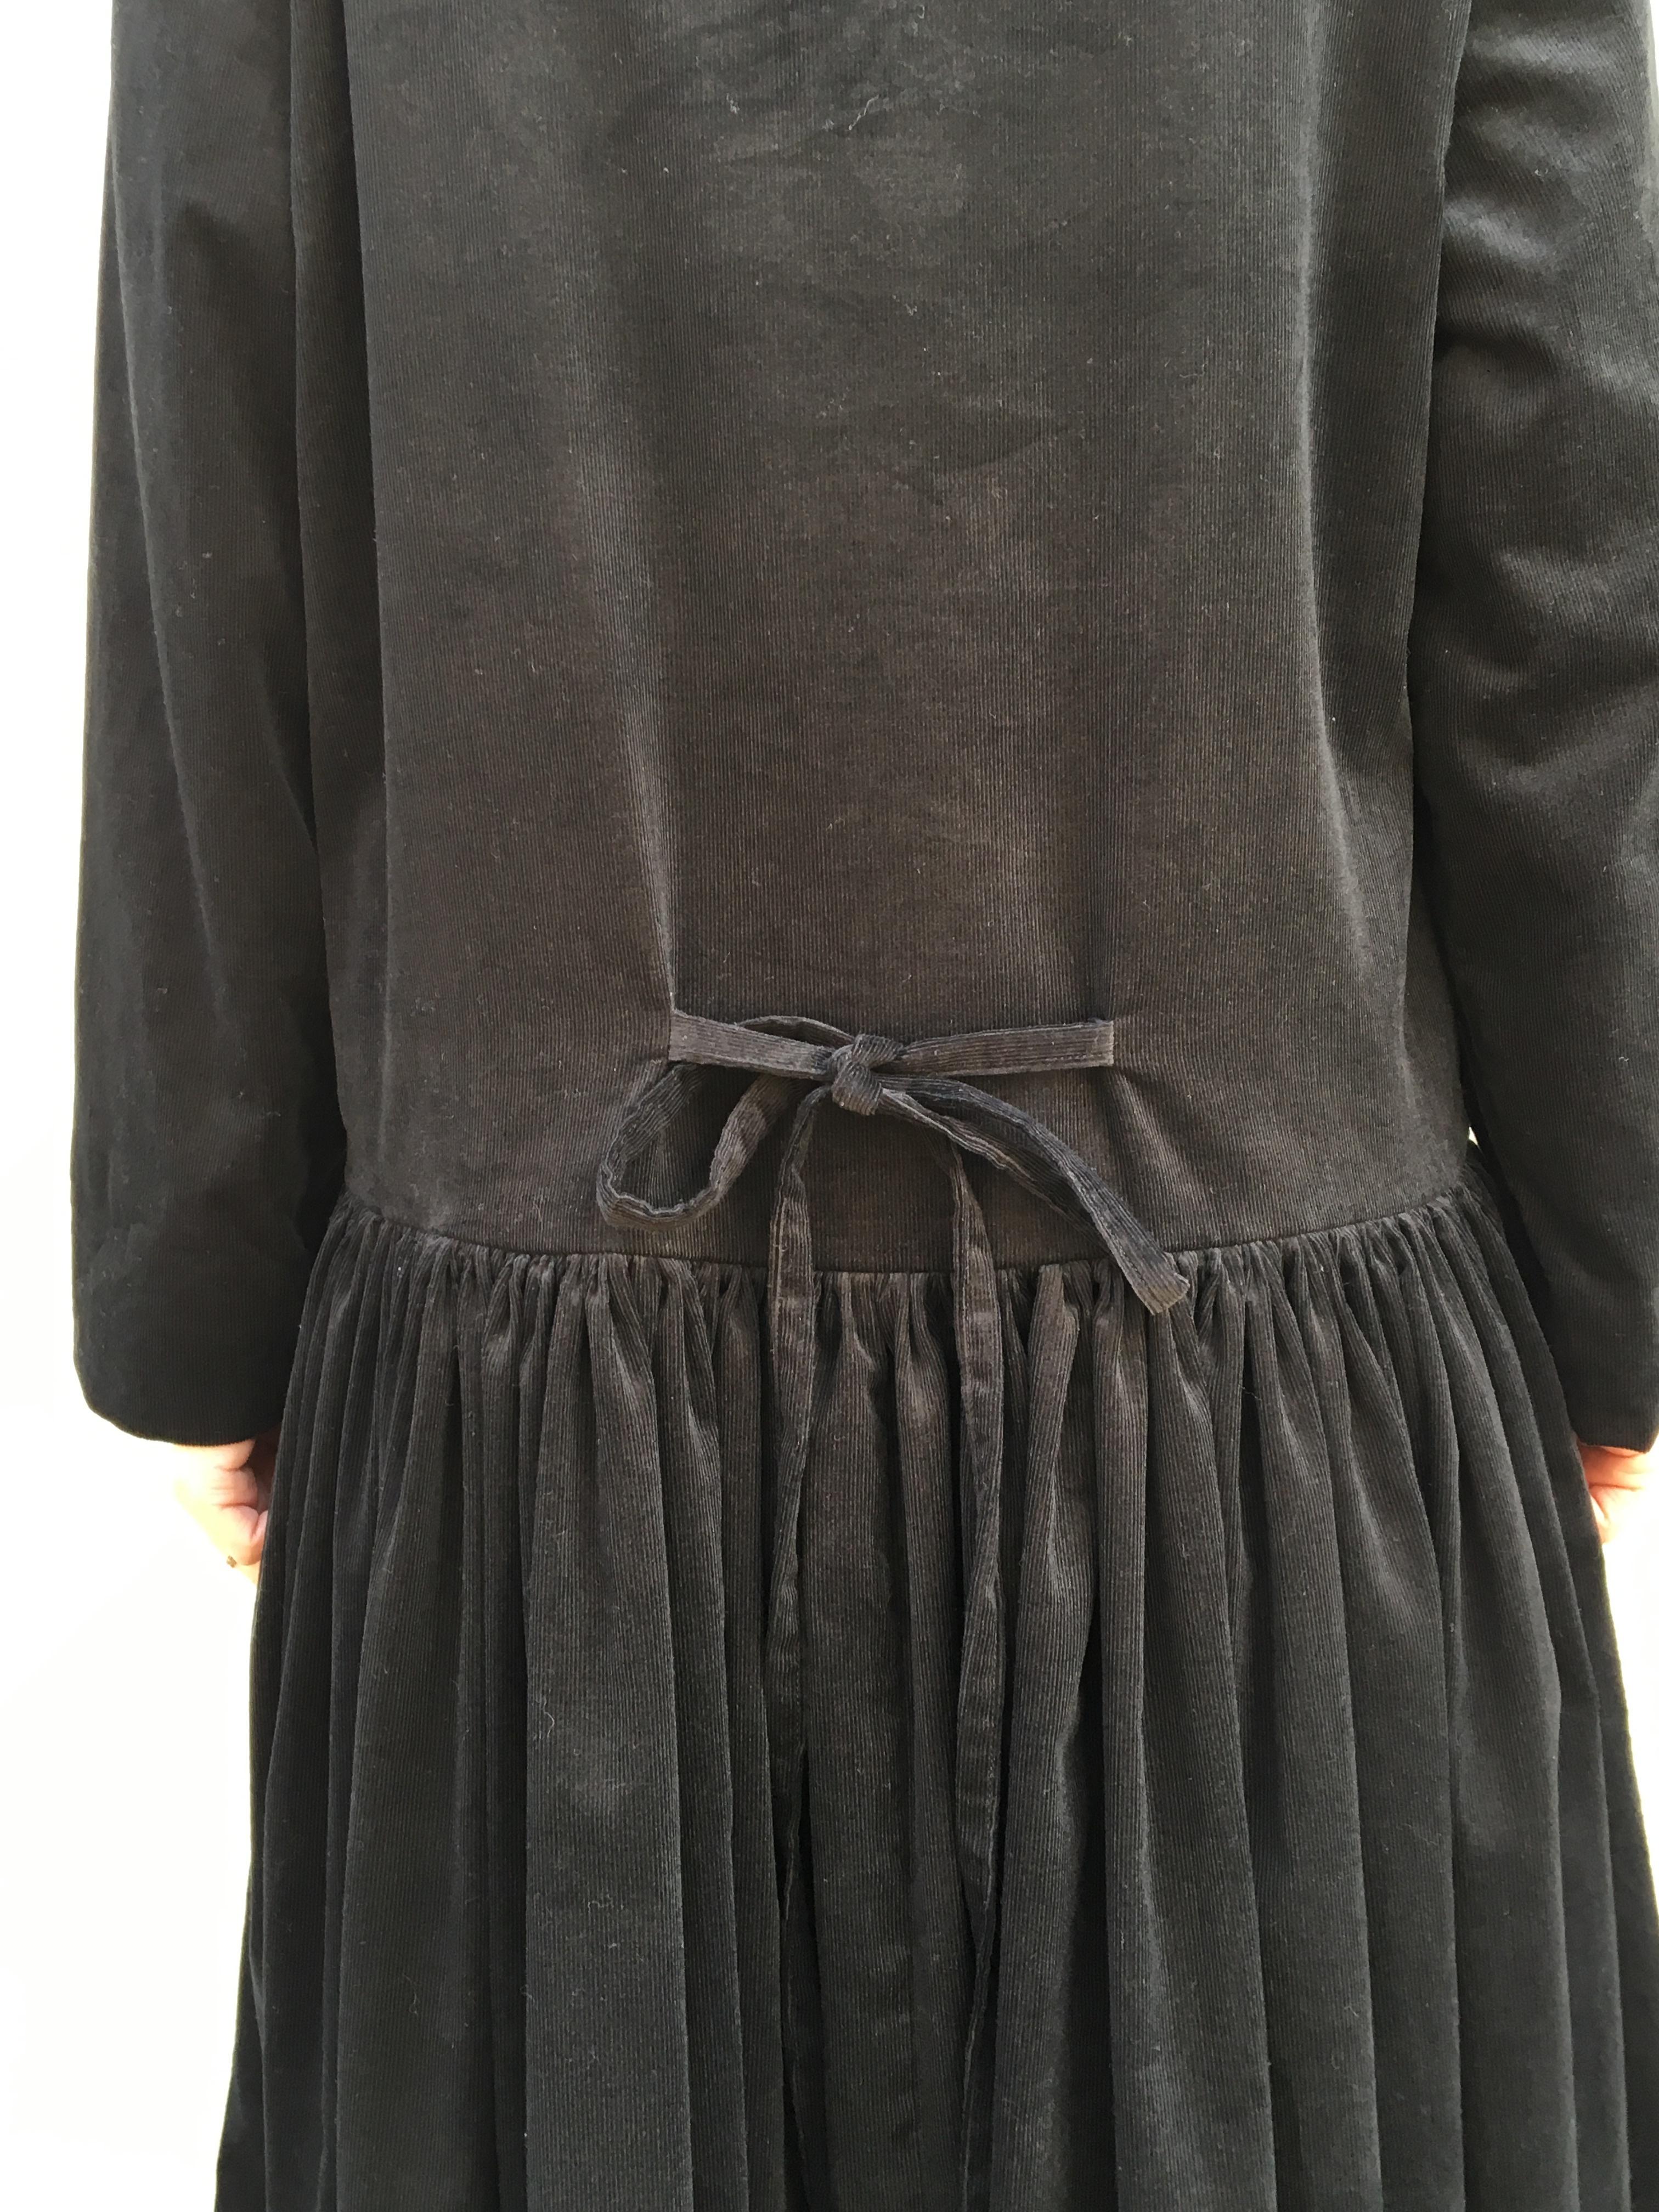 kosatofuku コーデュロイのロングギャザードレス